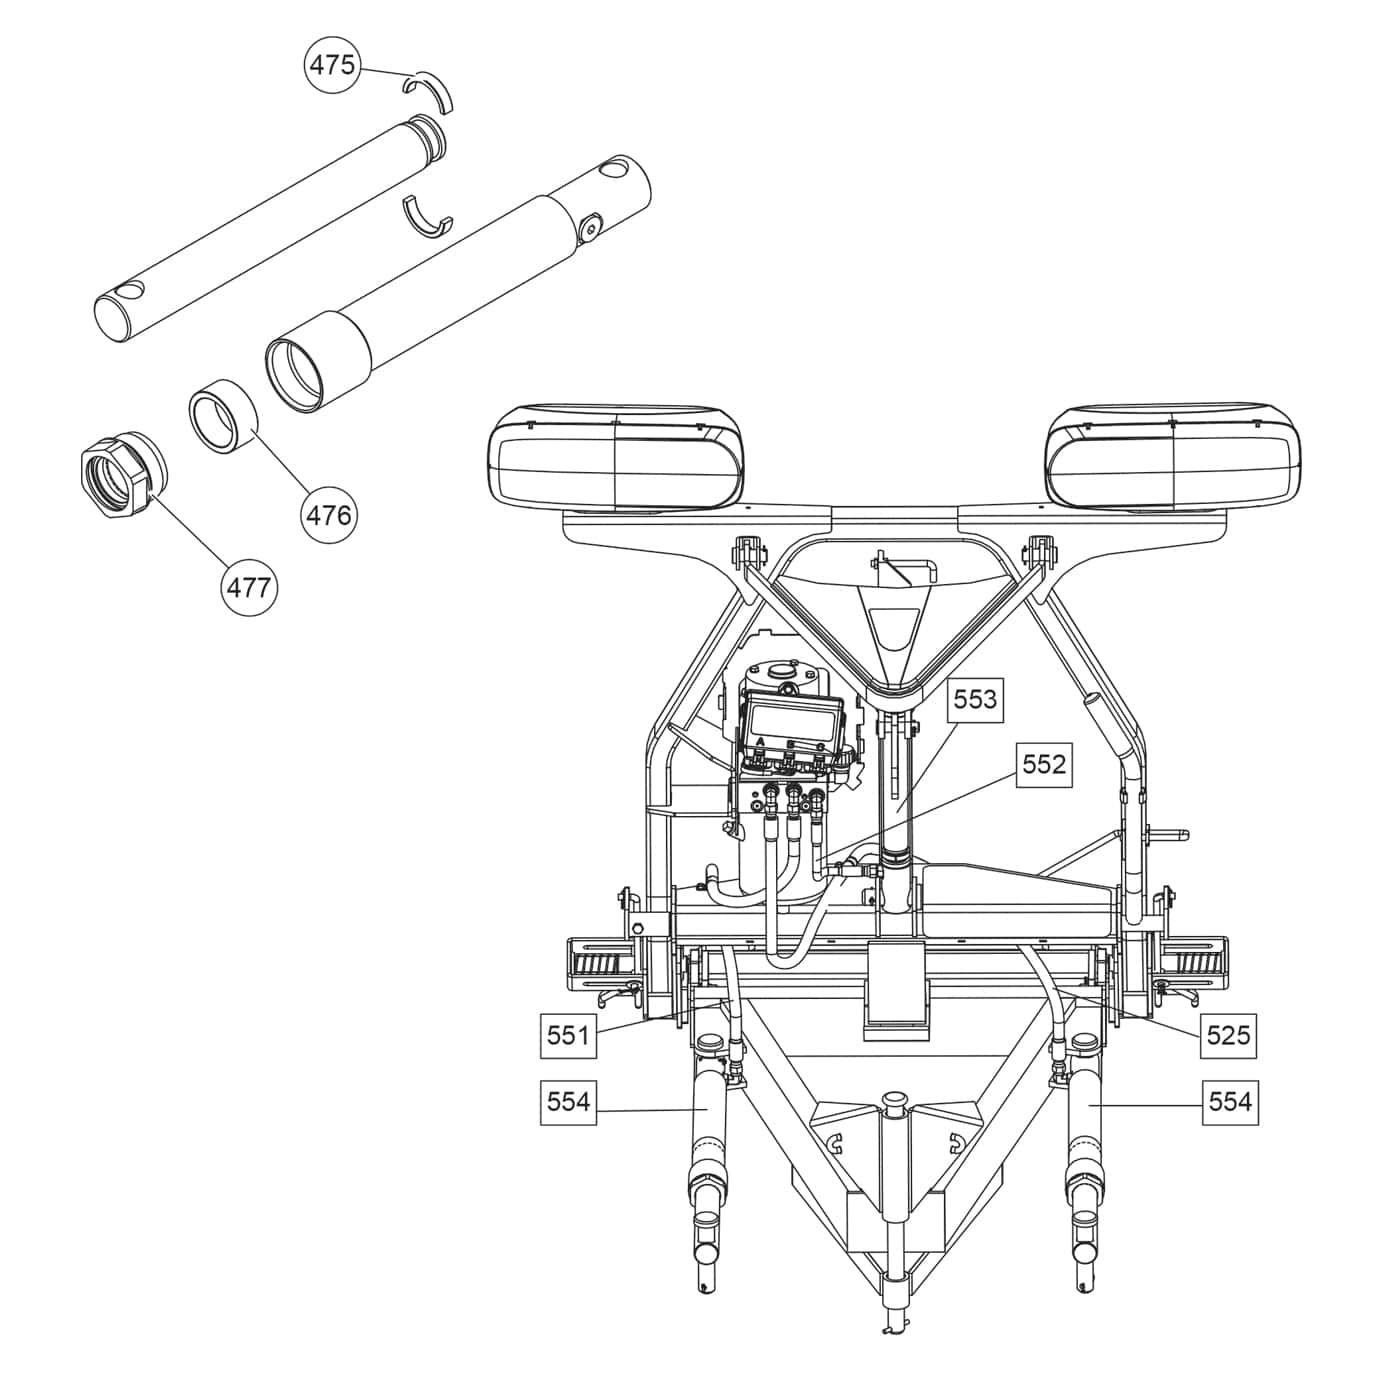 hydraulic ram diagram 99 ford mustang radio wiring fisher xblade hydraulics shop iteparts